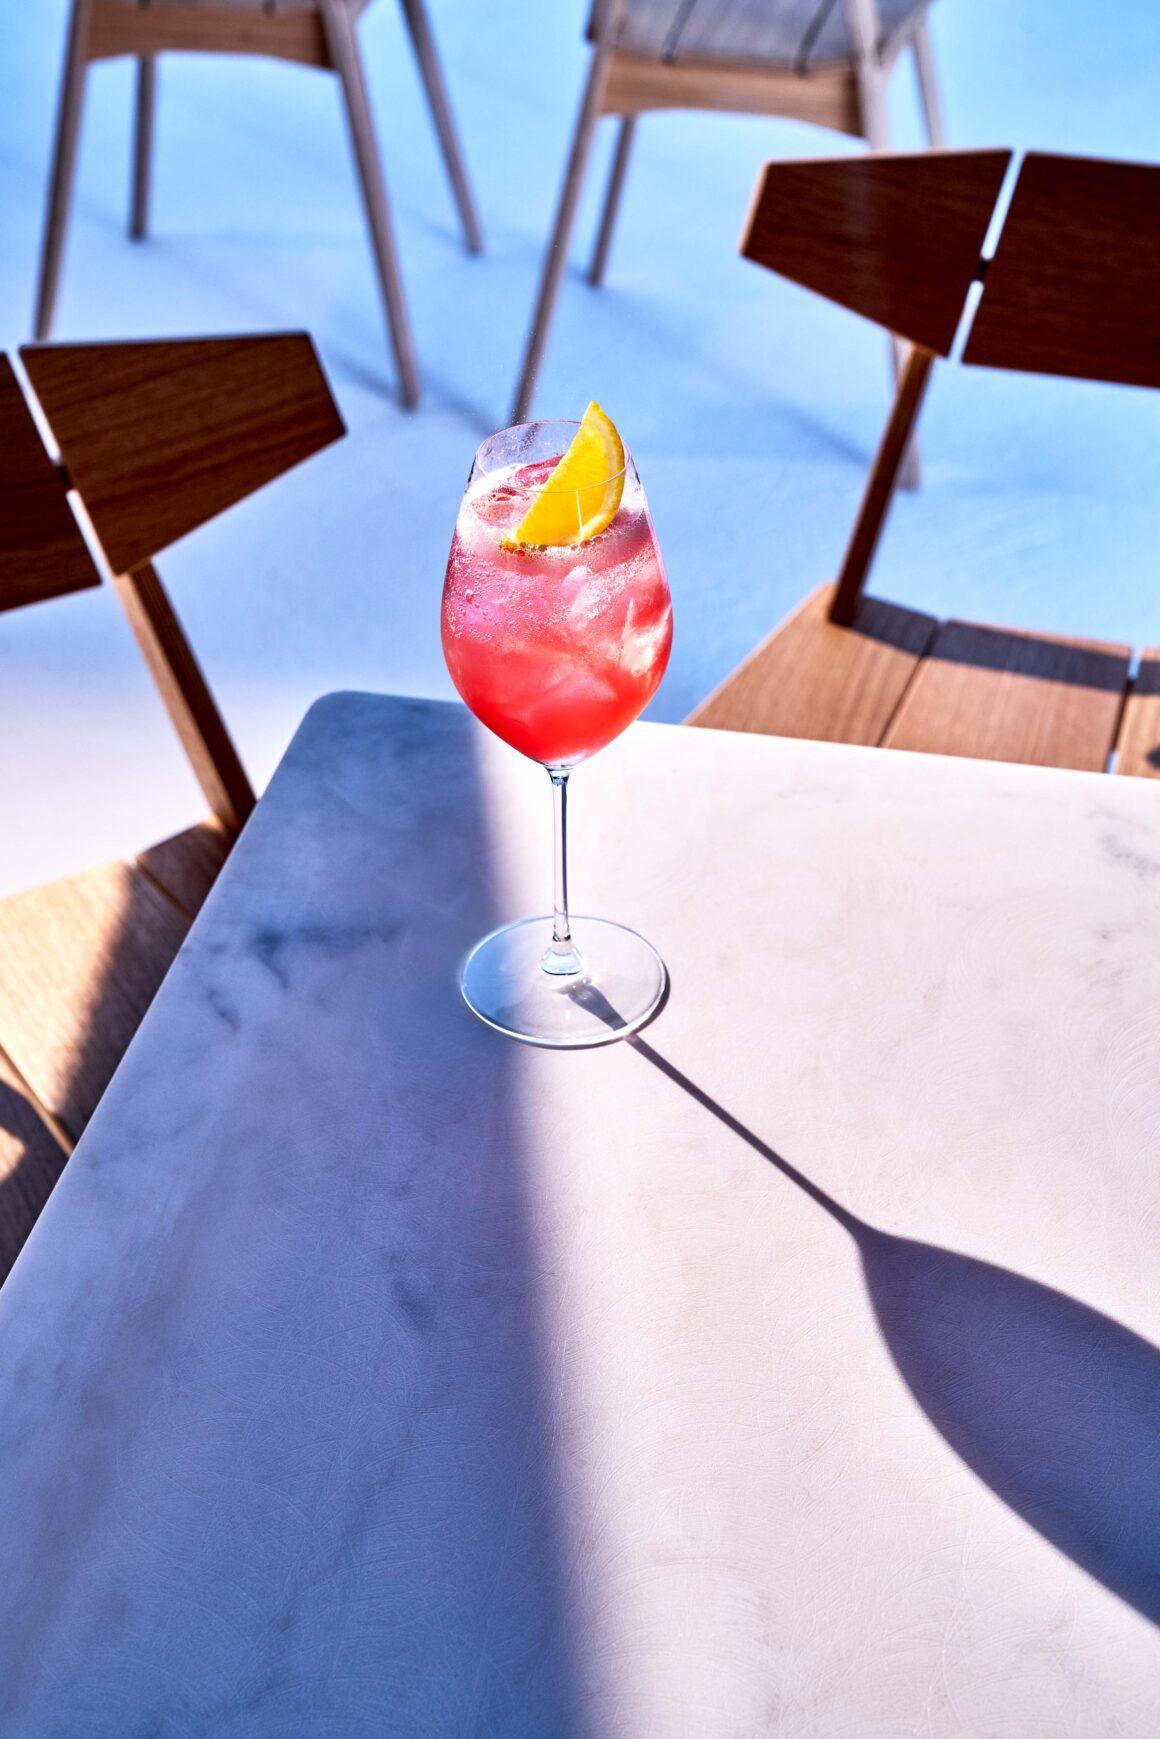 Best Summer Spritz Sippers - Bombay Sapphire Rose Spritz